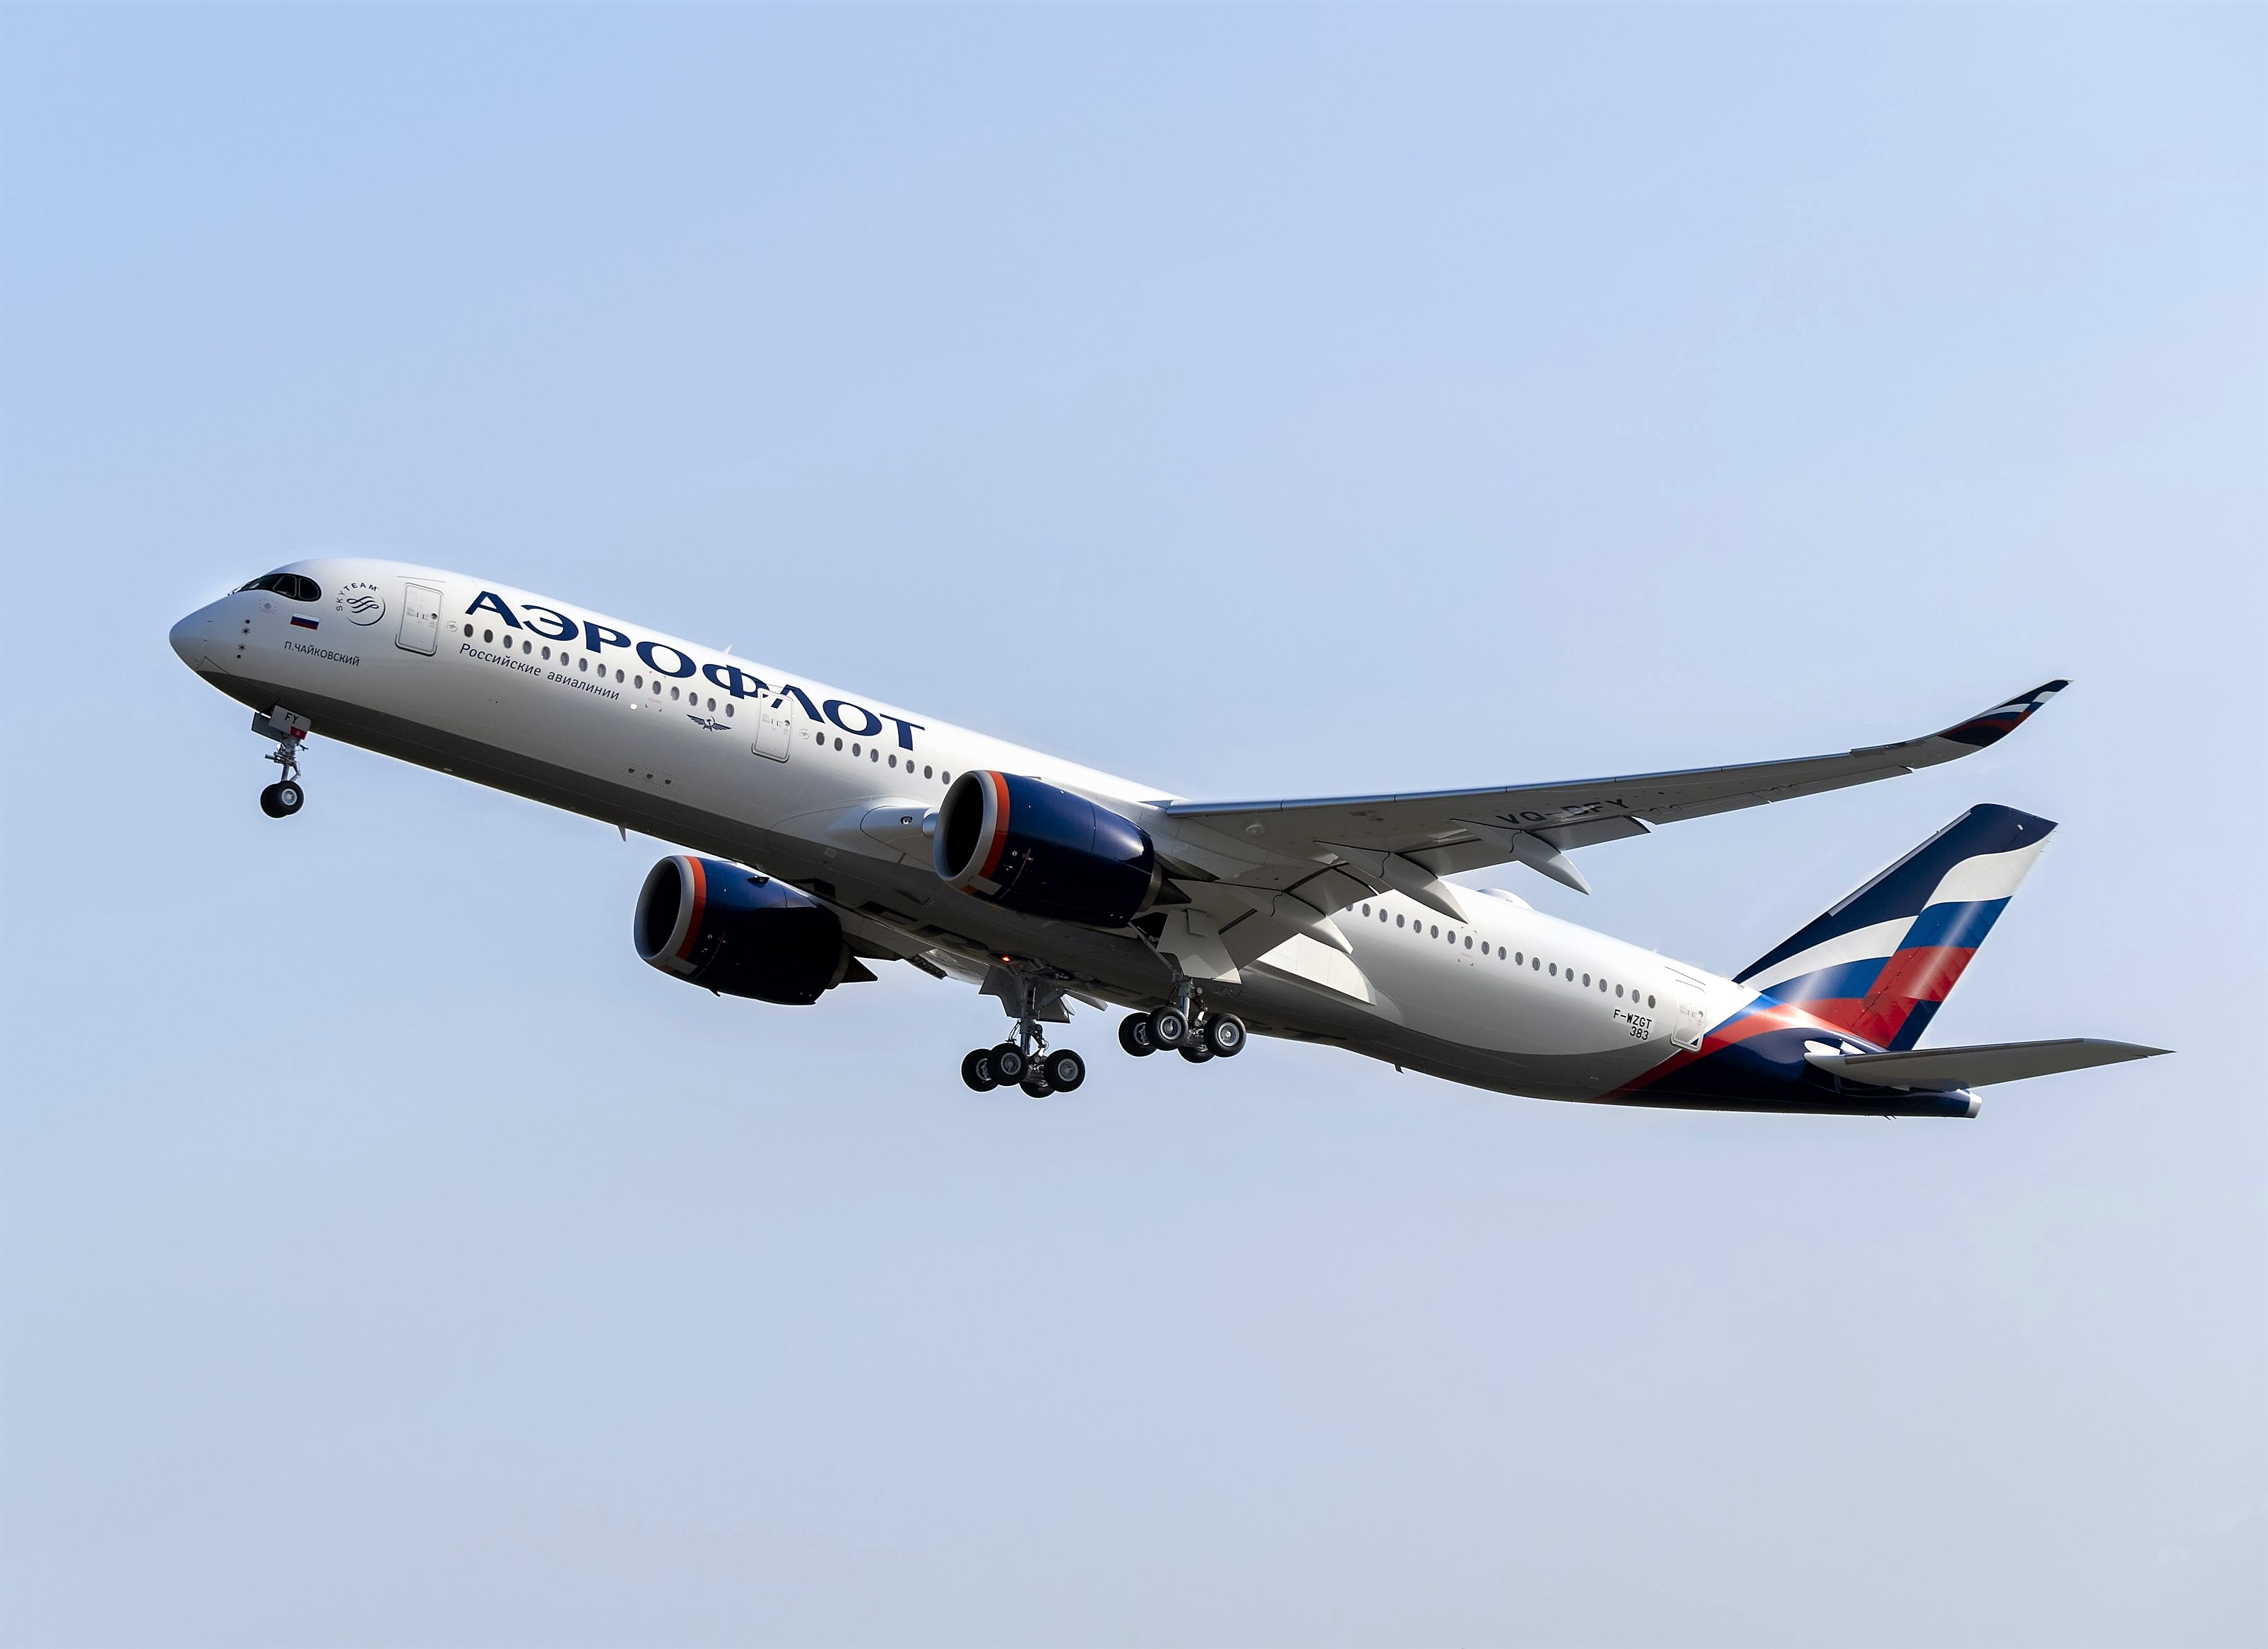 """Аэрофлот"" поставил Airbus A350 на линию Москва - Сочи"